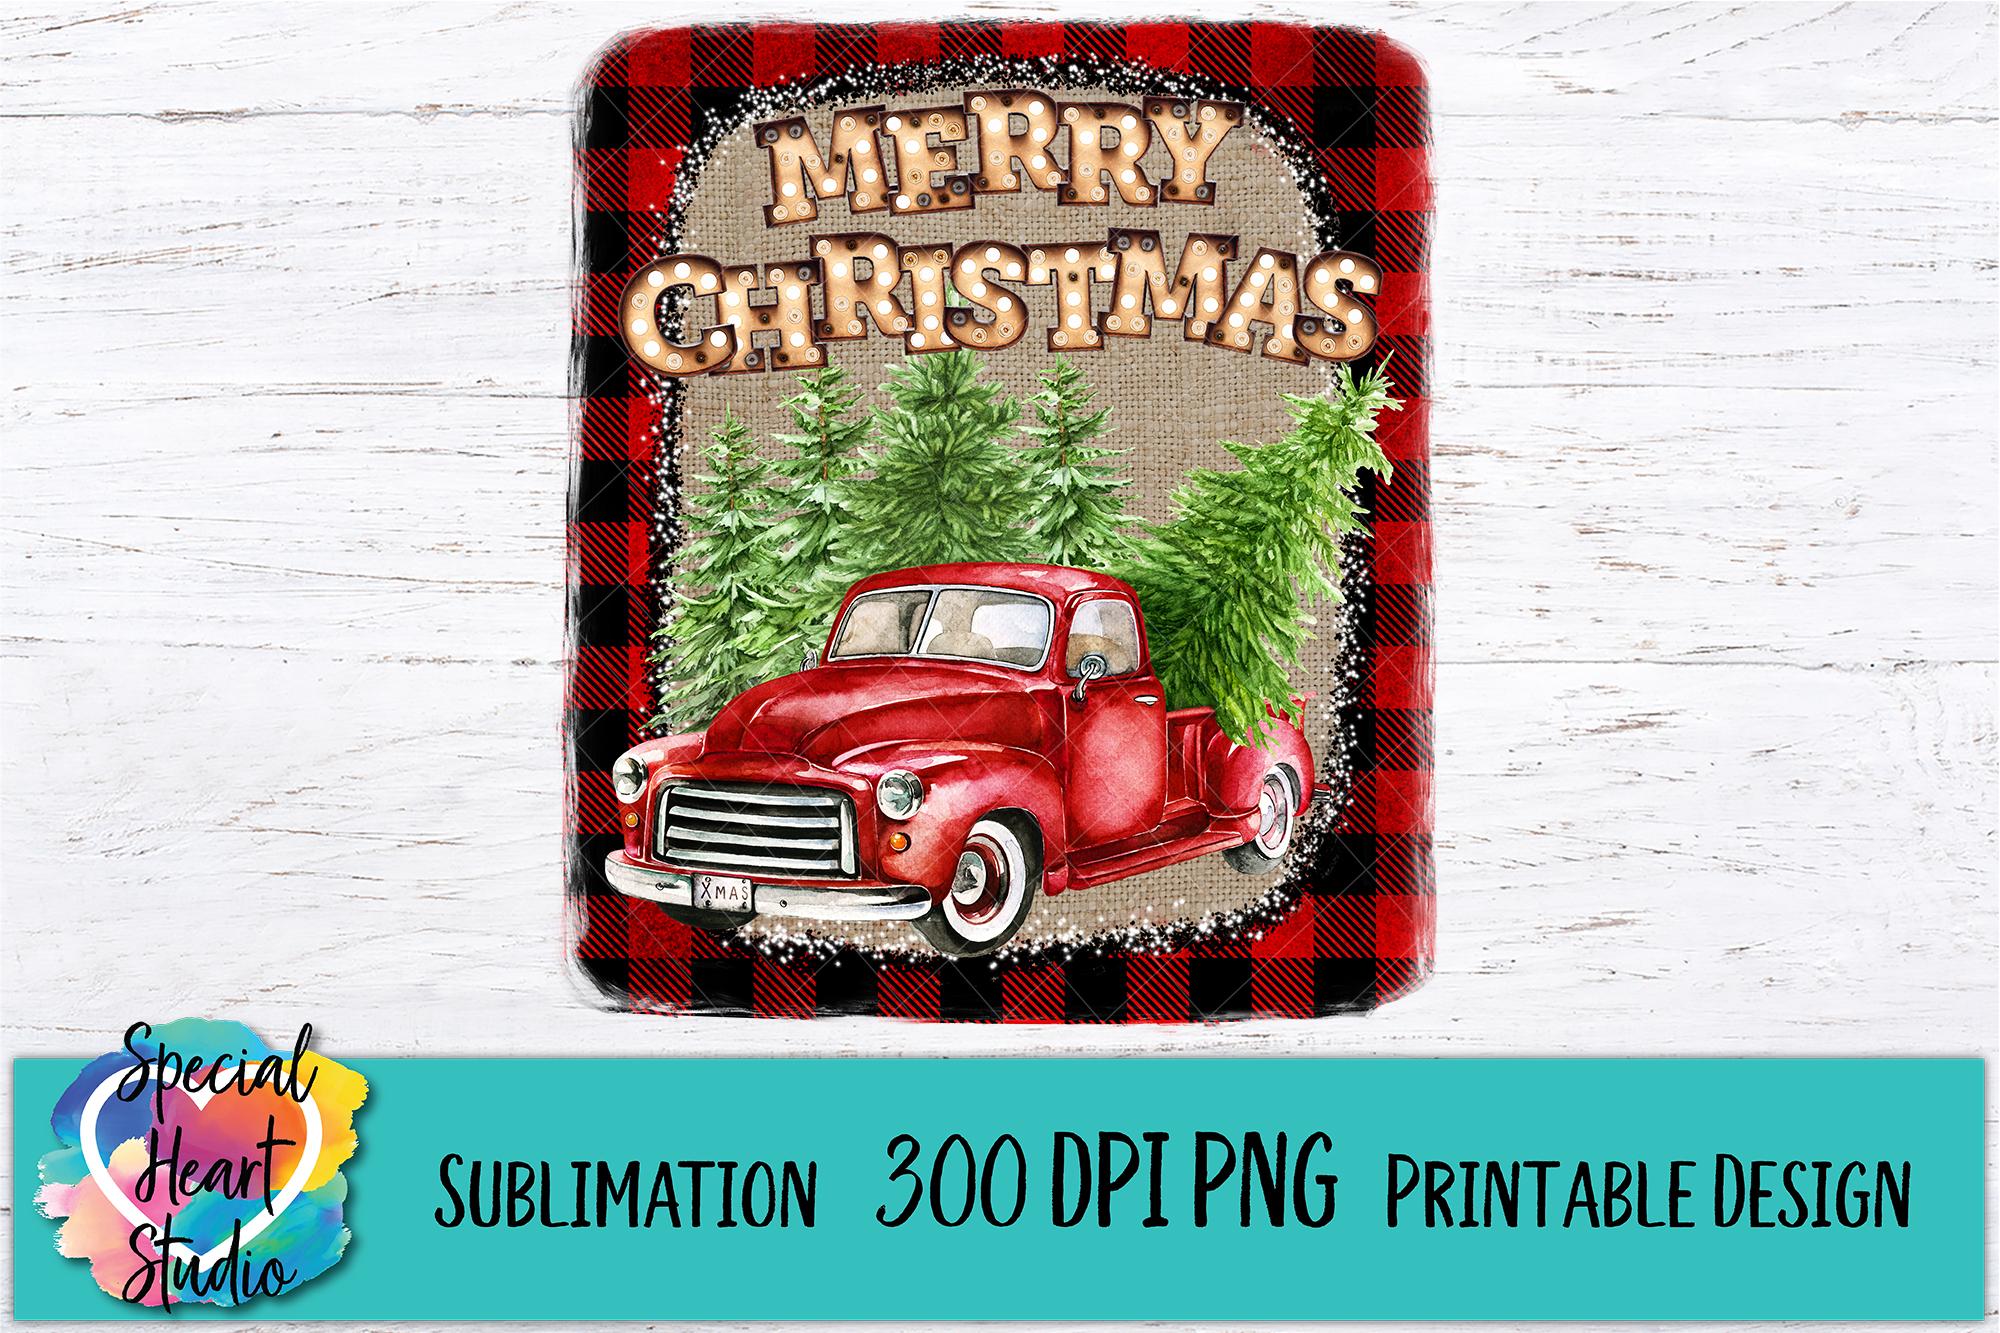 Buffalo Plaid Burlap Red Truck - Christmas Sublimation example image 2